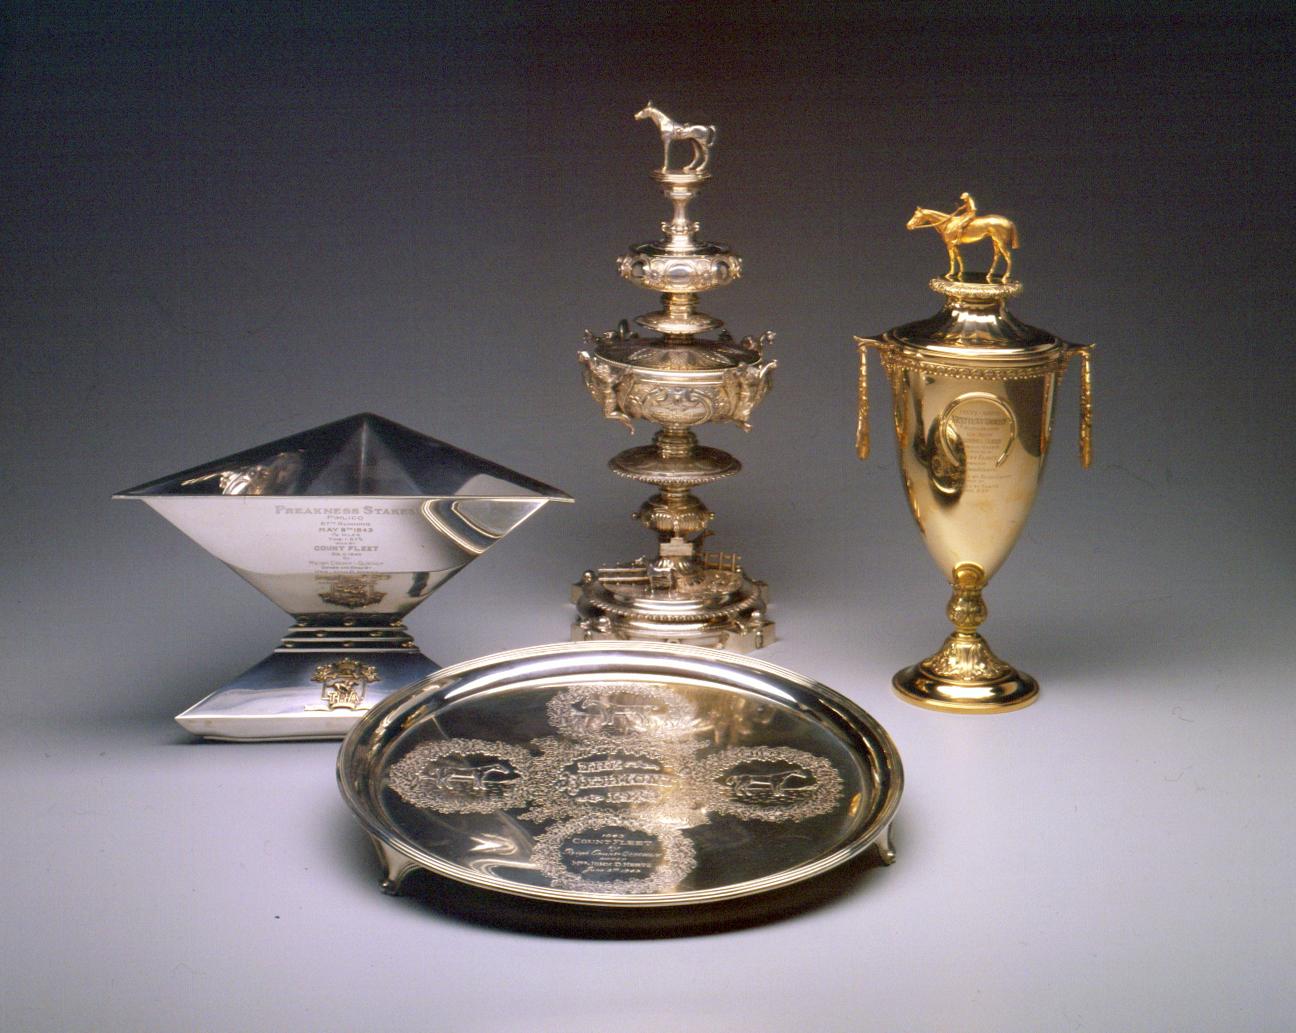 1971.3.1-.2, 1975.3.1-.2: The Triple Crown Trophies of Count Fleet